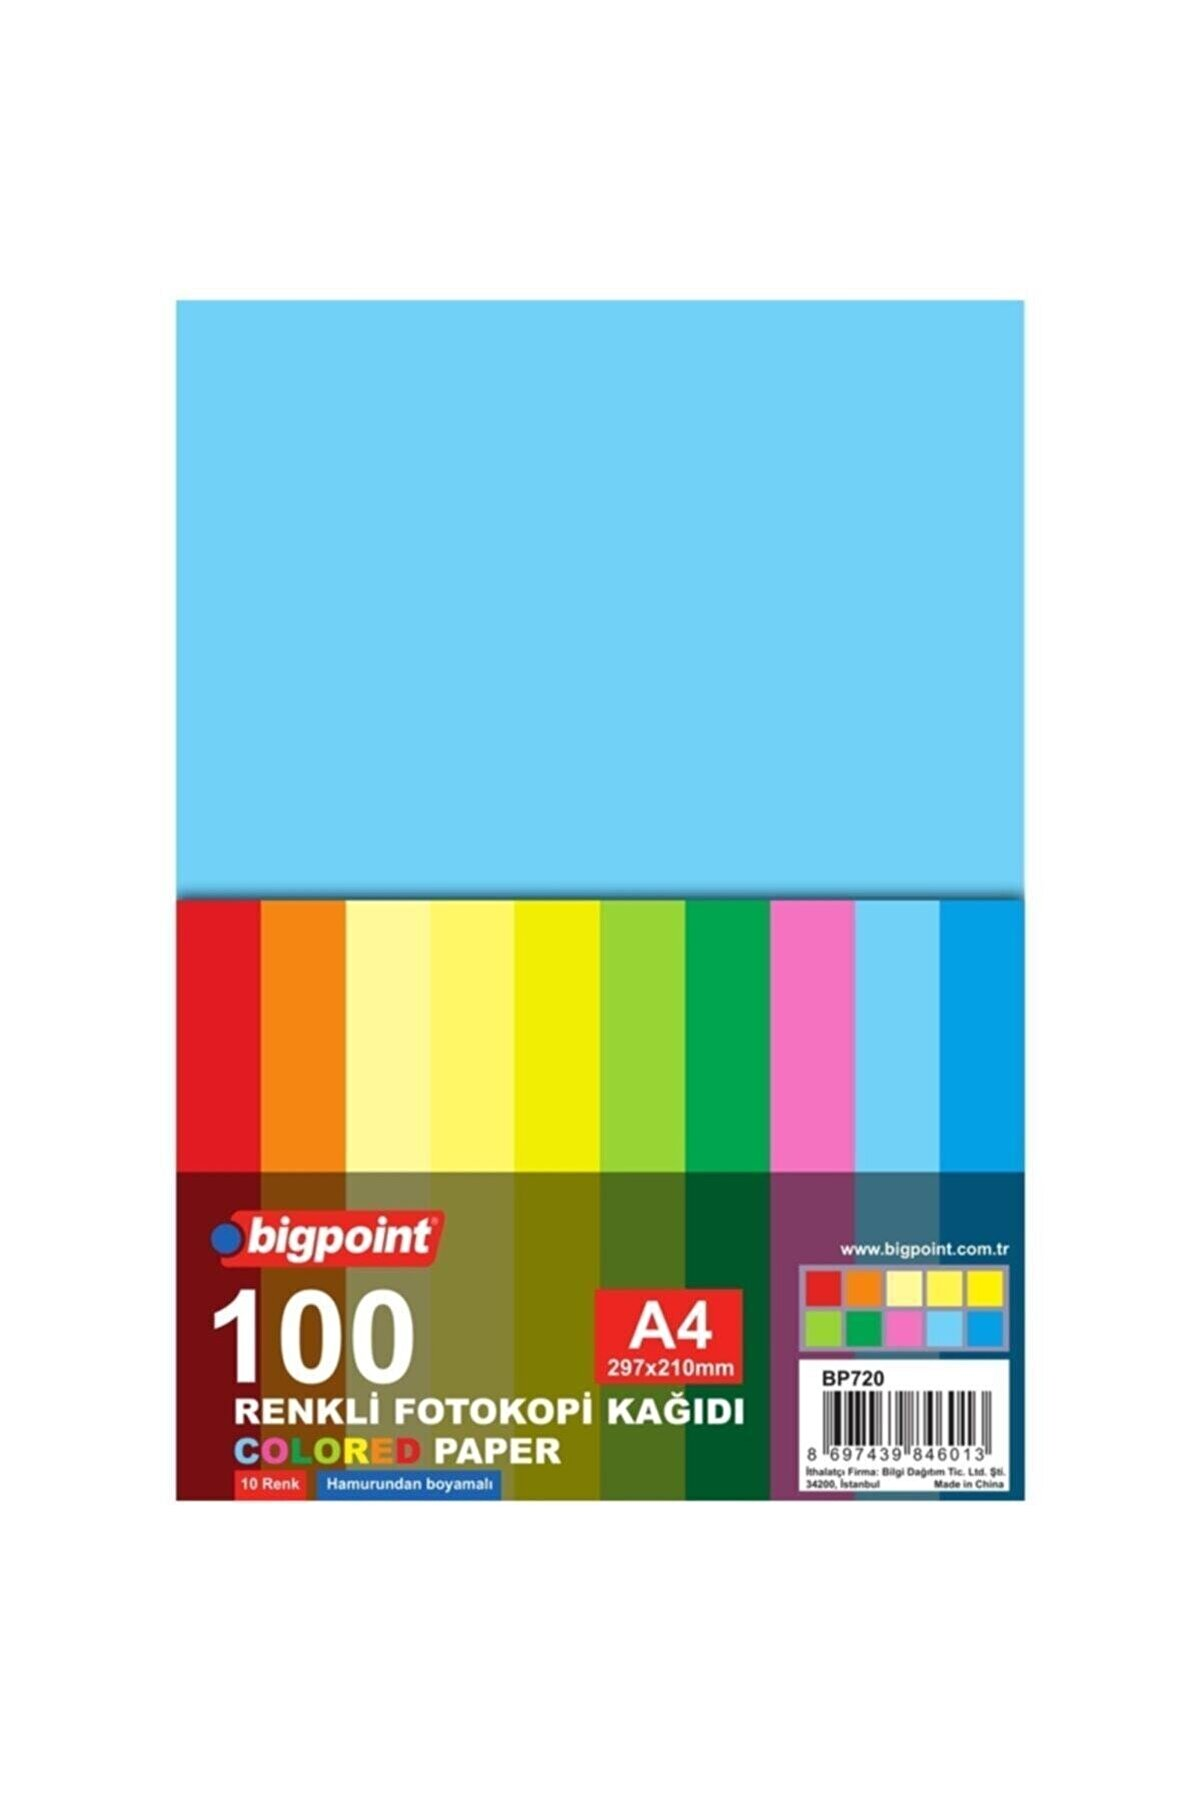 Bigpoint Renkli Fotokopi Kağıdı 80 gr A4 100 Yaprak 10 Renk